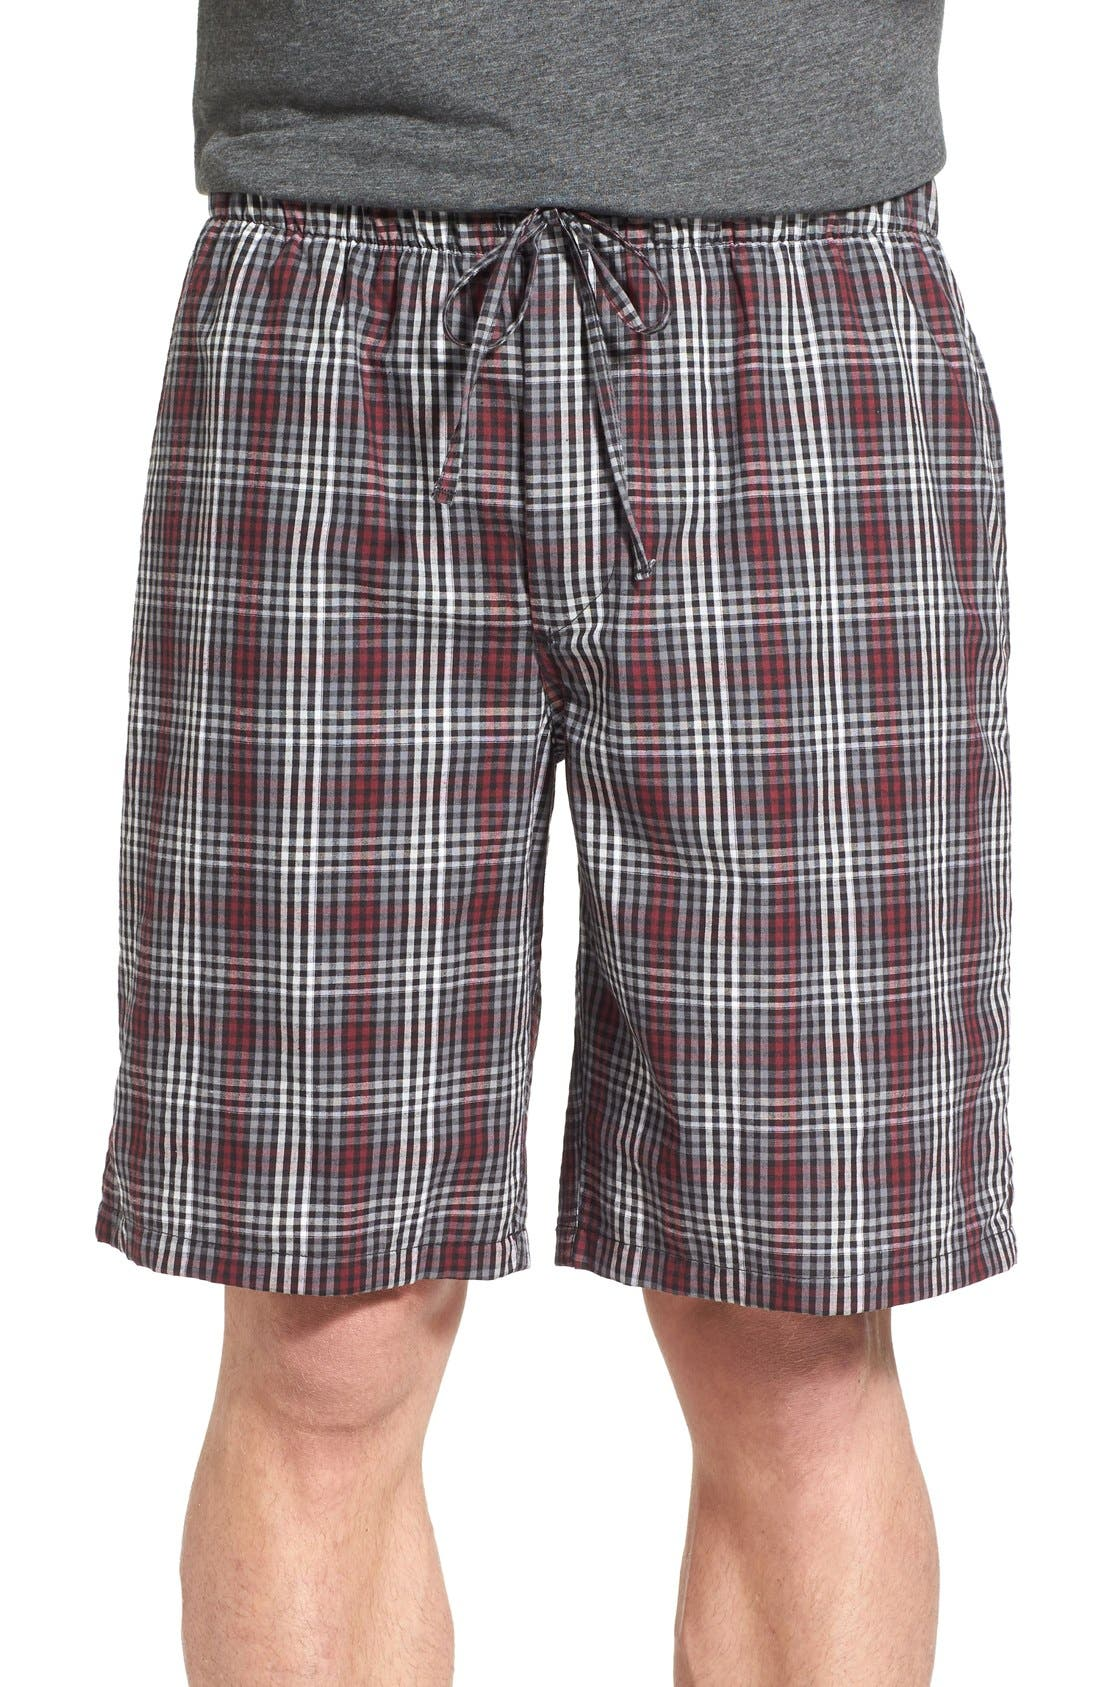 NORDSTROM MENS SHOP Nordstrom Plaid Pajama Shorts